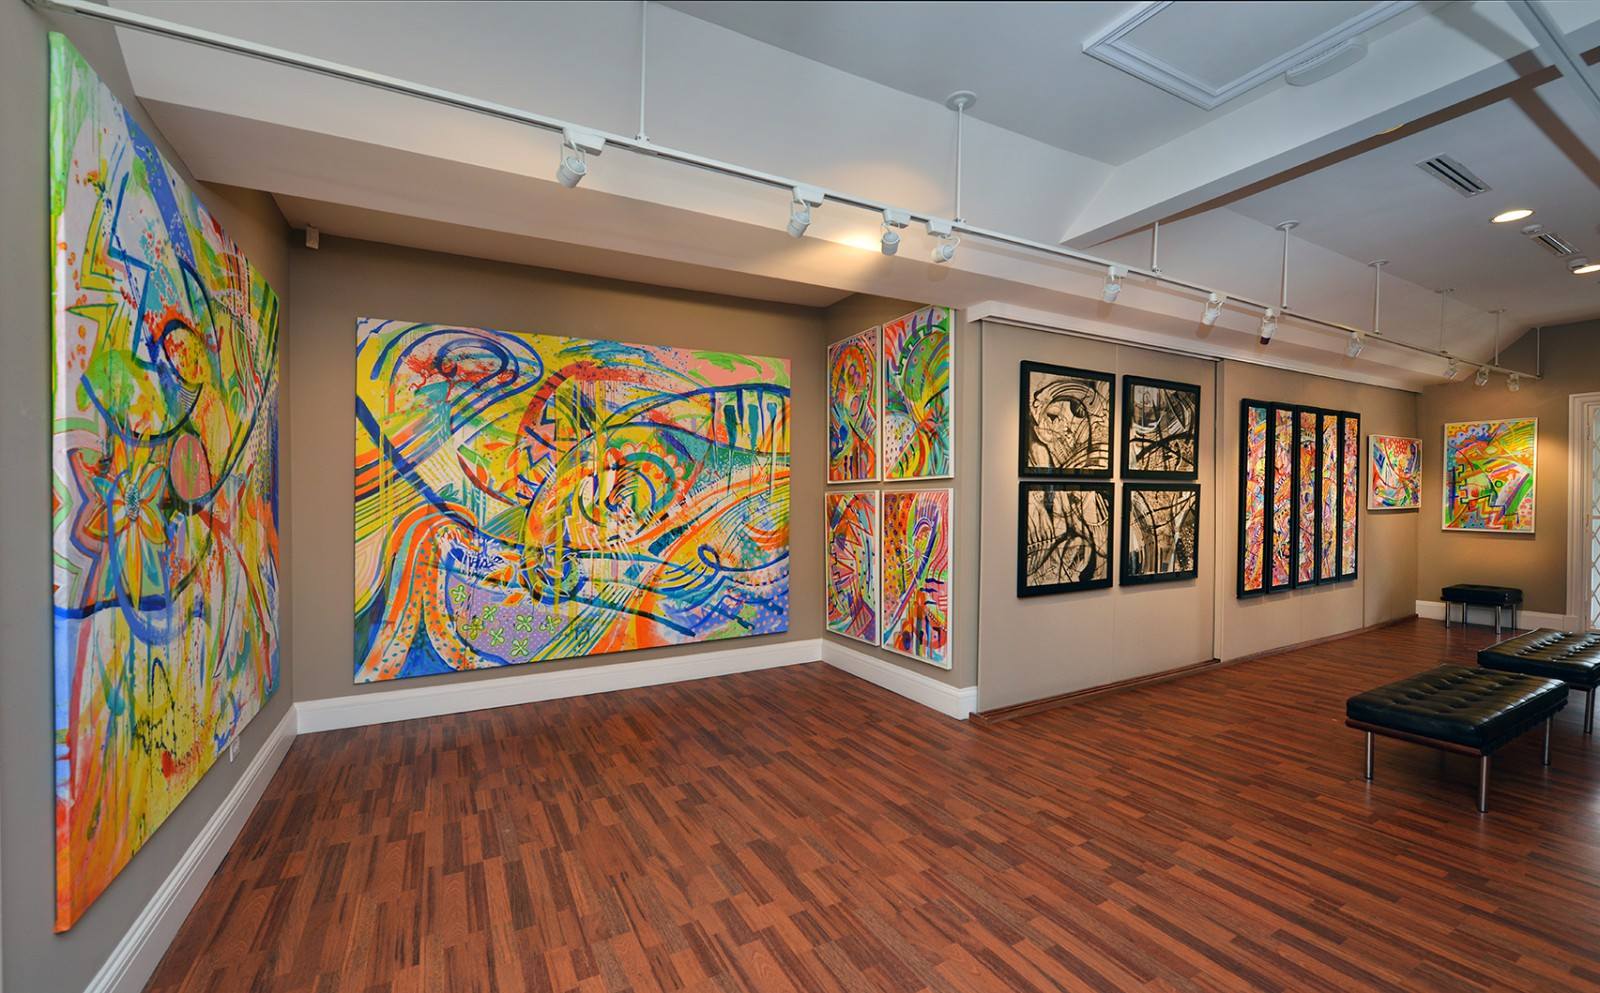 D Painting Exhibition : The d aguilar art foundation nassau bahamas home